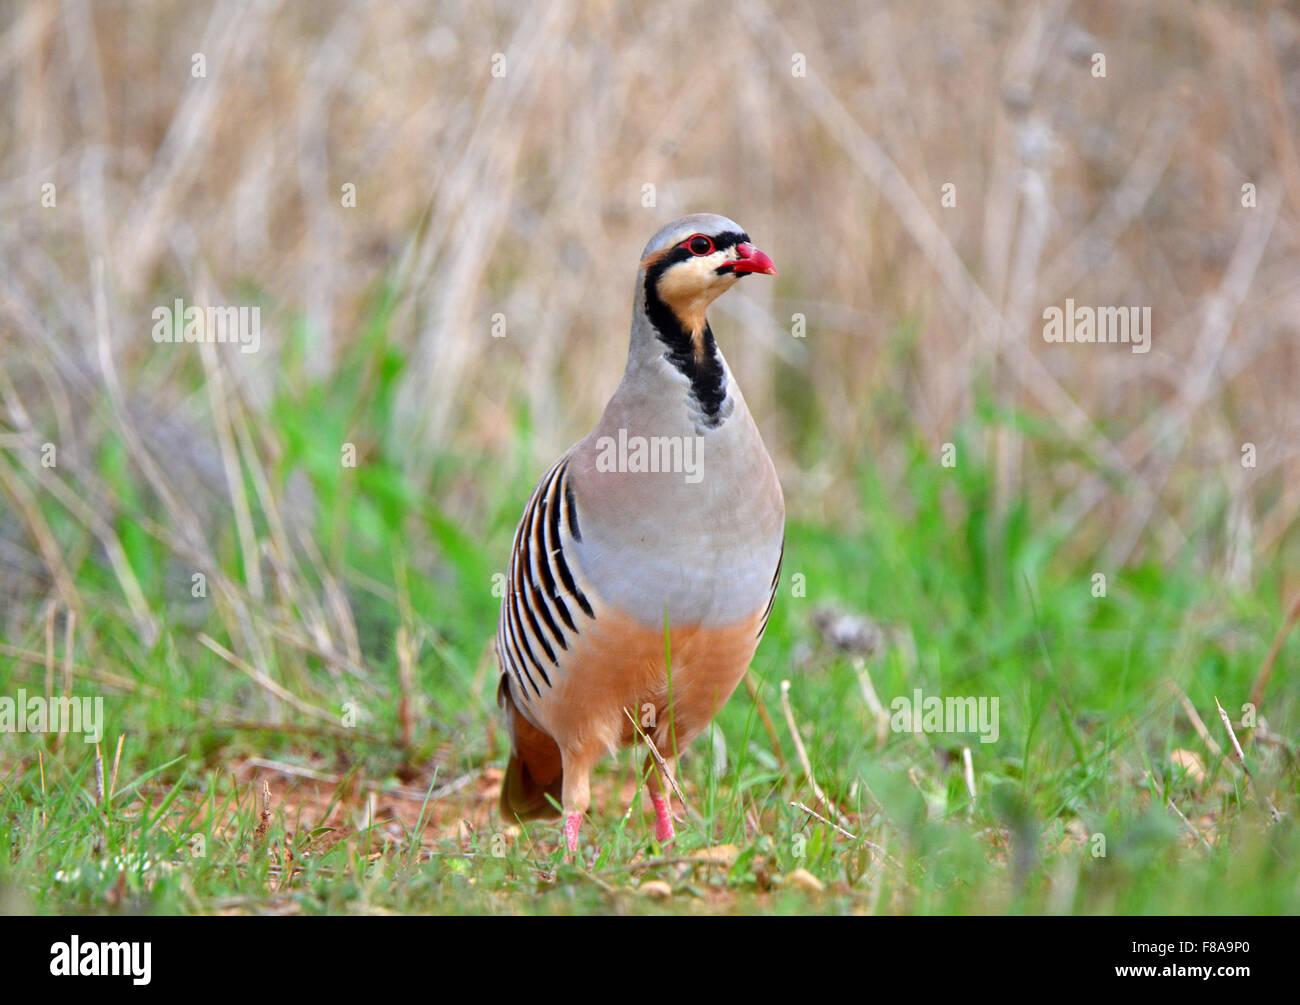 Red-legged Partridge, Alectoris chukar - Stock Image